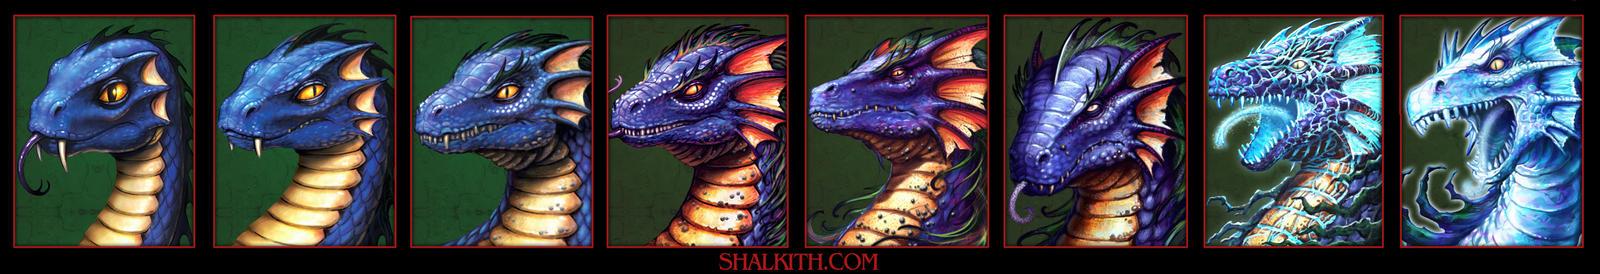 Blue Dragon Age Progression by VegasMike